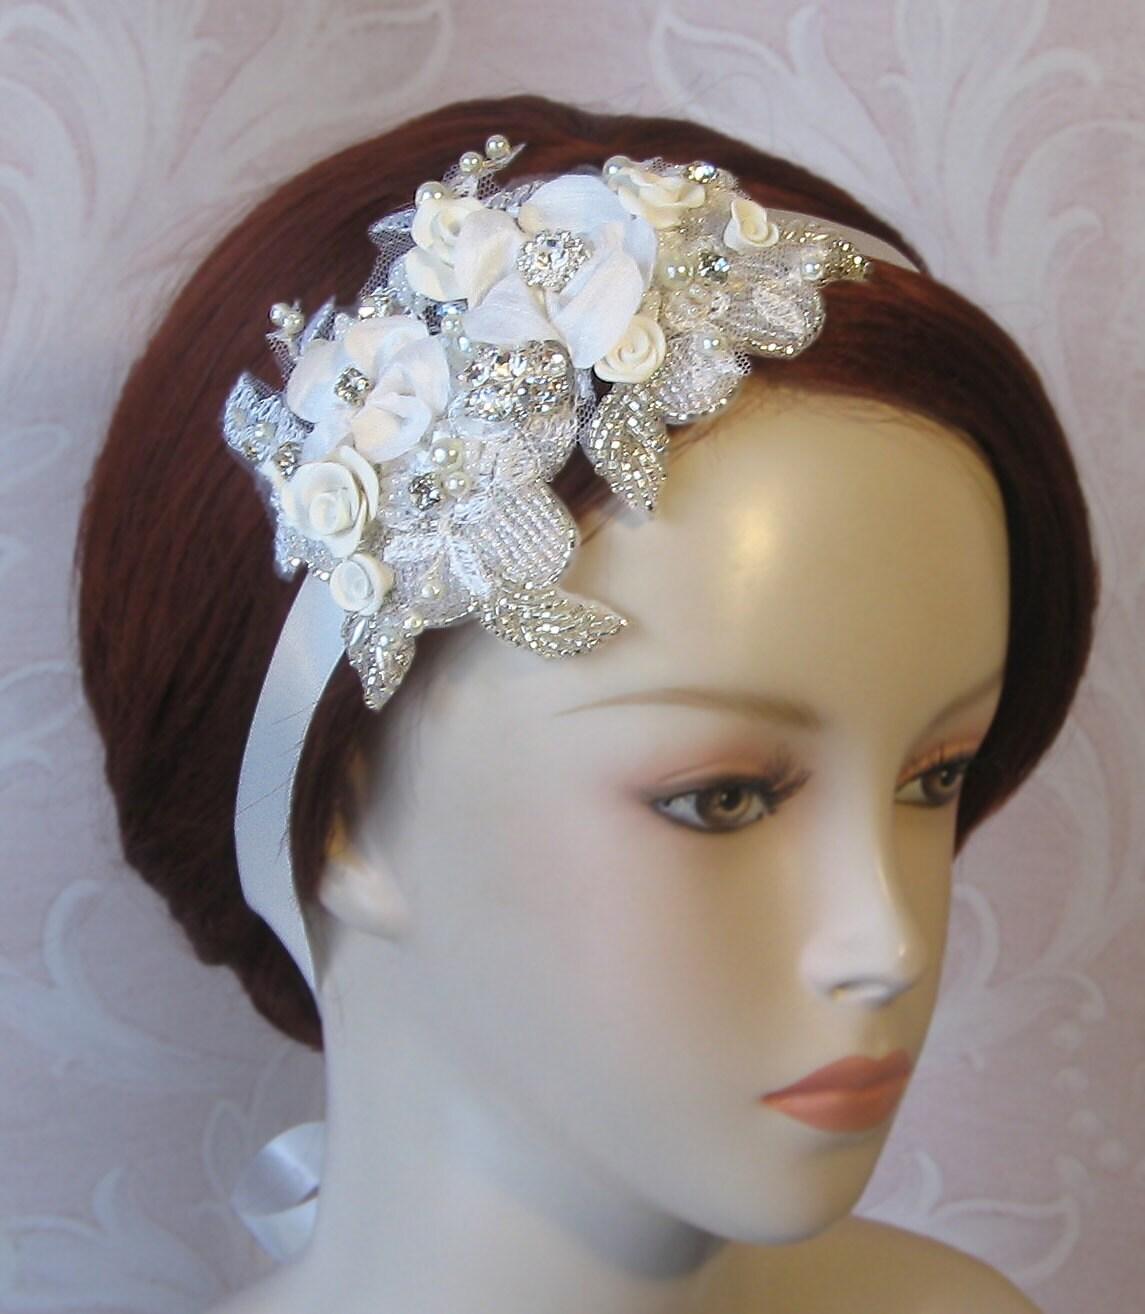 Bridal Headpiece, Headband, Wedding Head Piece, Lace, Flowers, Rhinestones and Pearls, Bridal Cap, Juliet Cap - SOPHIA